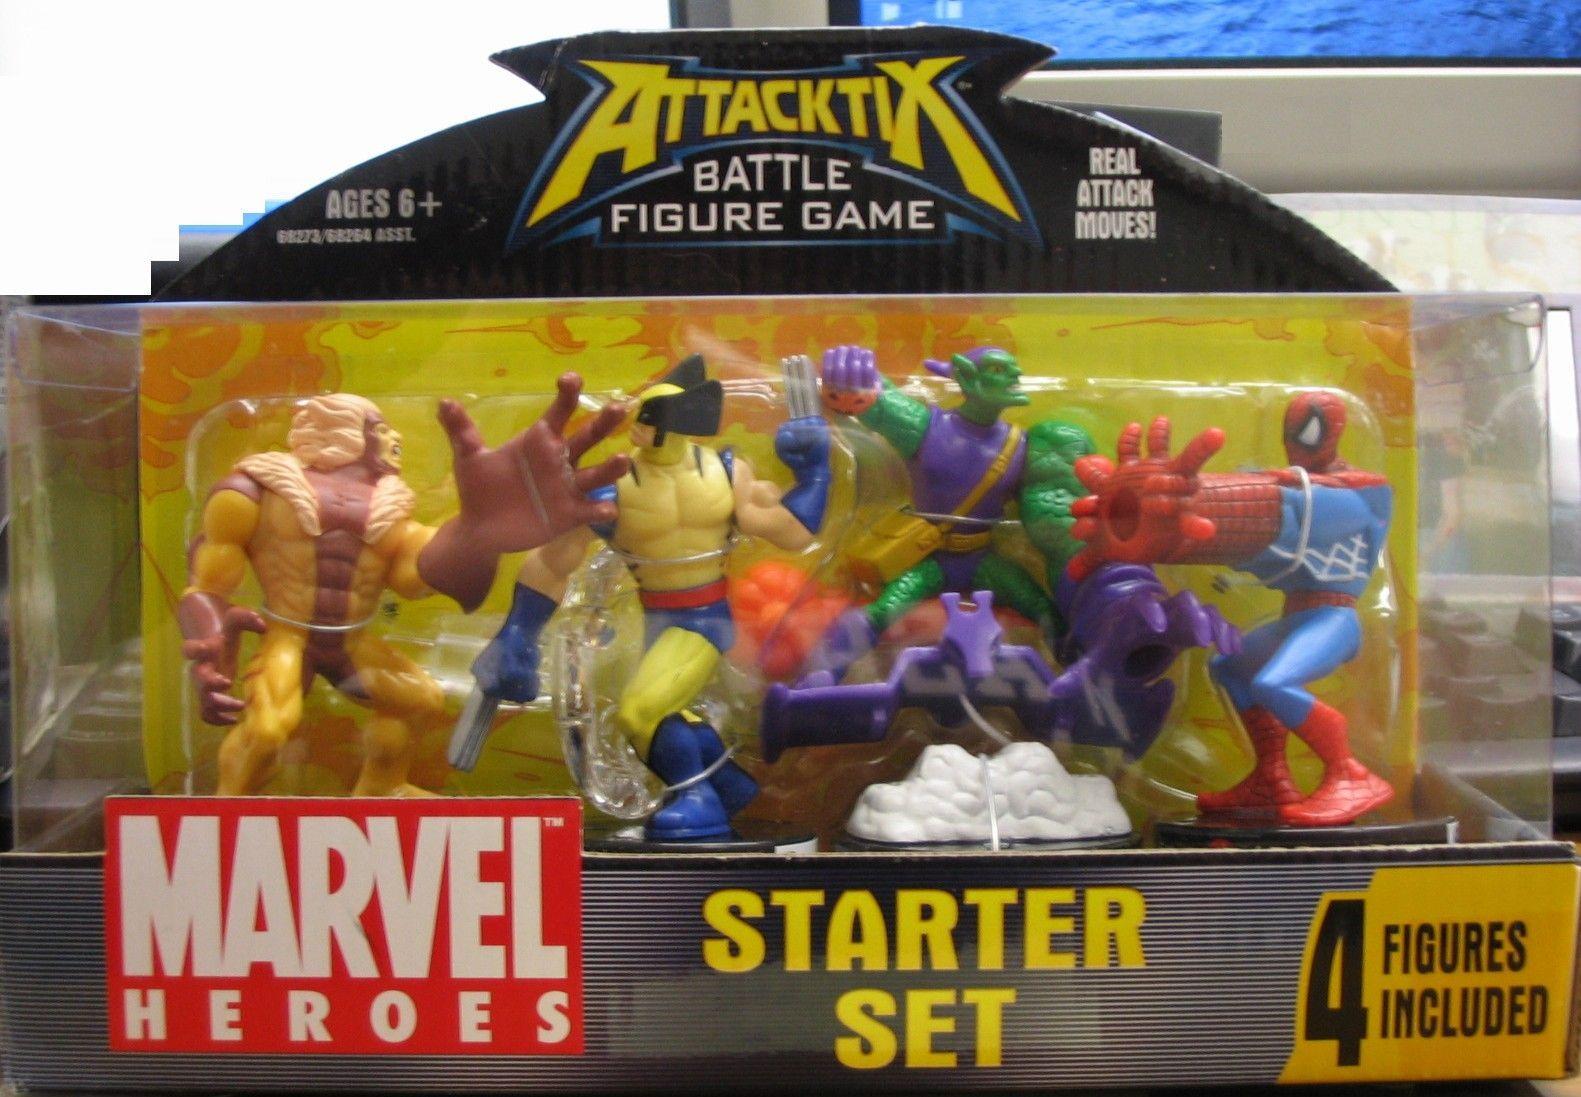 Attacktix Battle Figure Game Marvel Superheroes